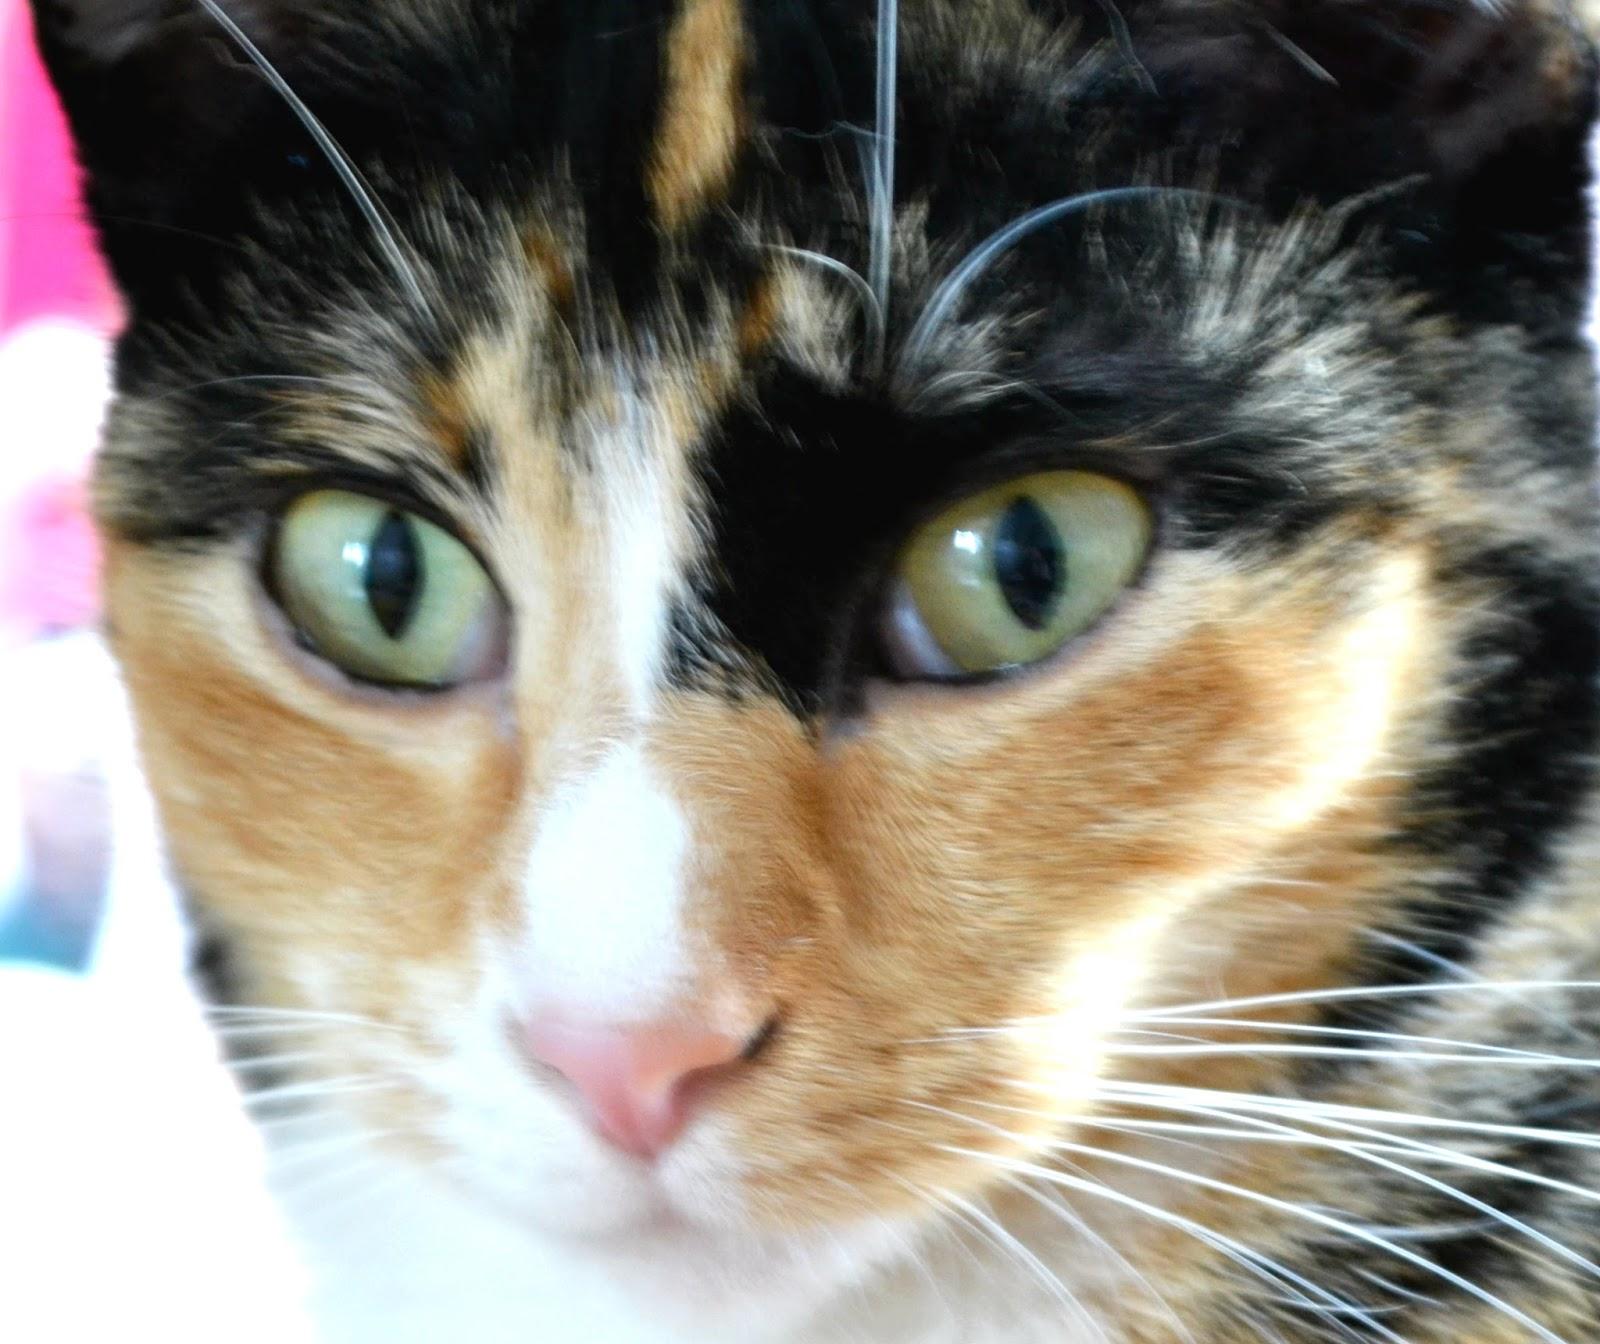 Cat Showing Whites Of Eyes